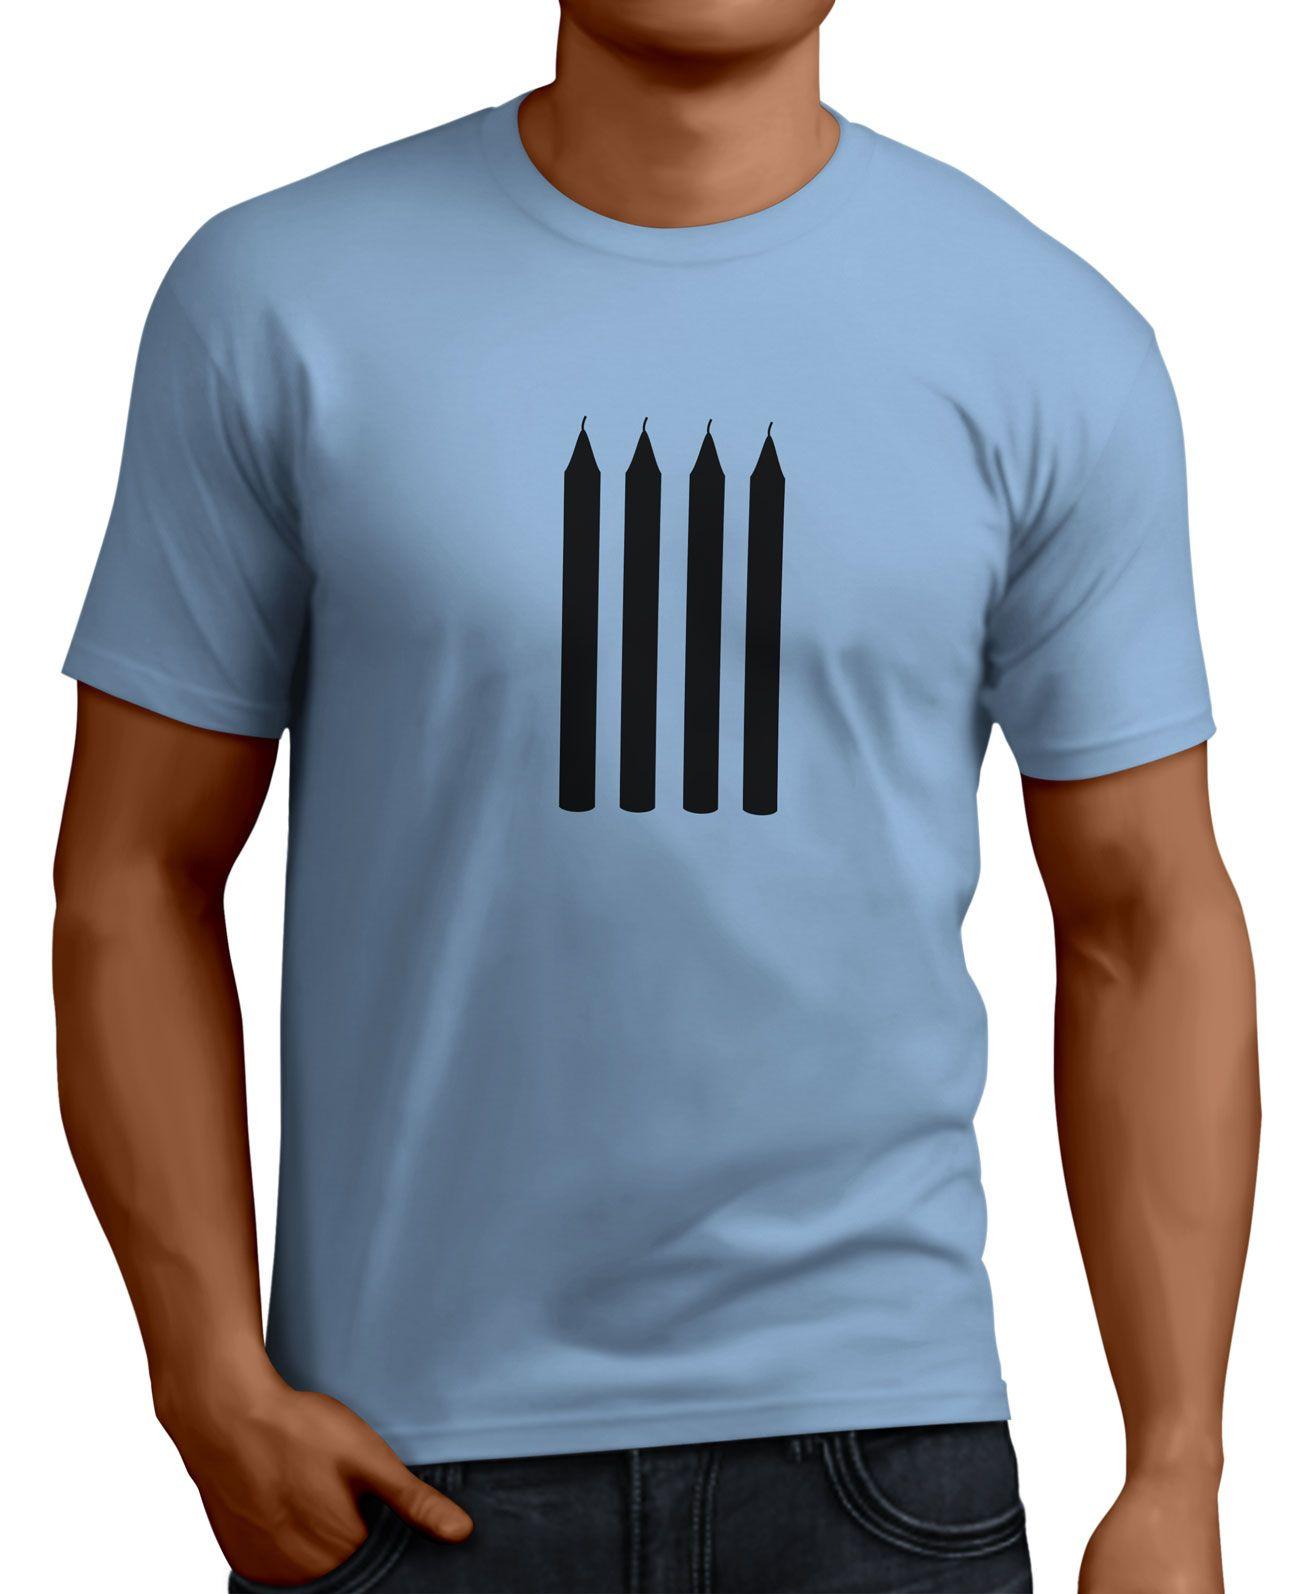 4b52342a Humour T Shirts Uk - DREAMWORKS